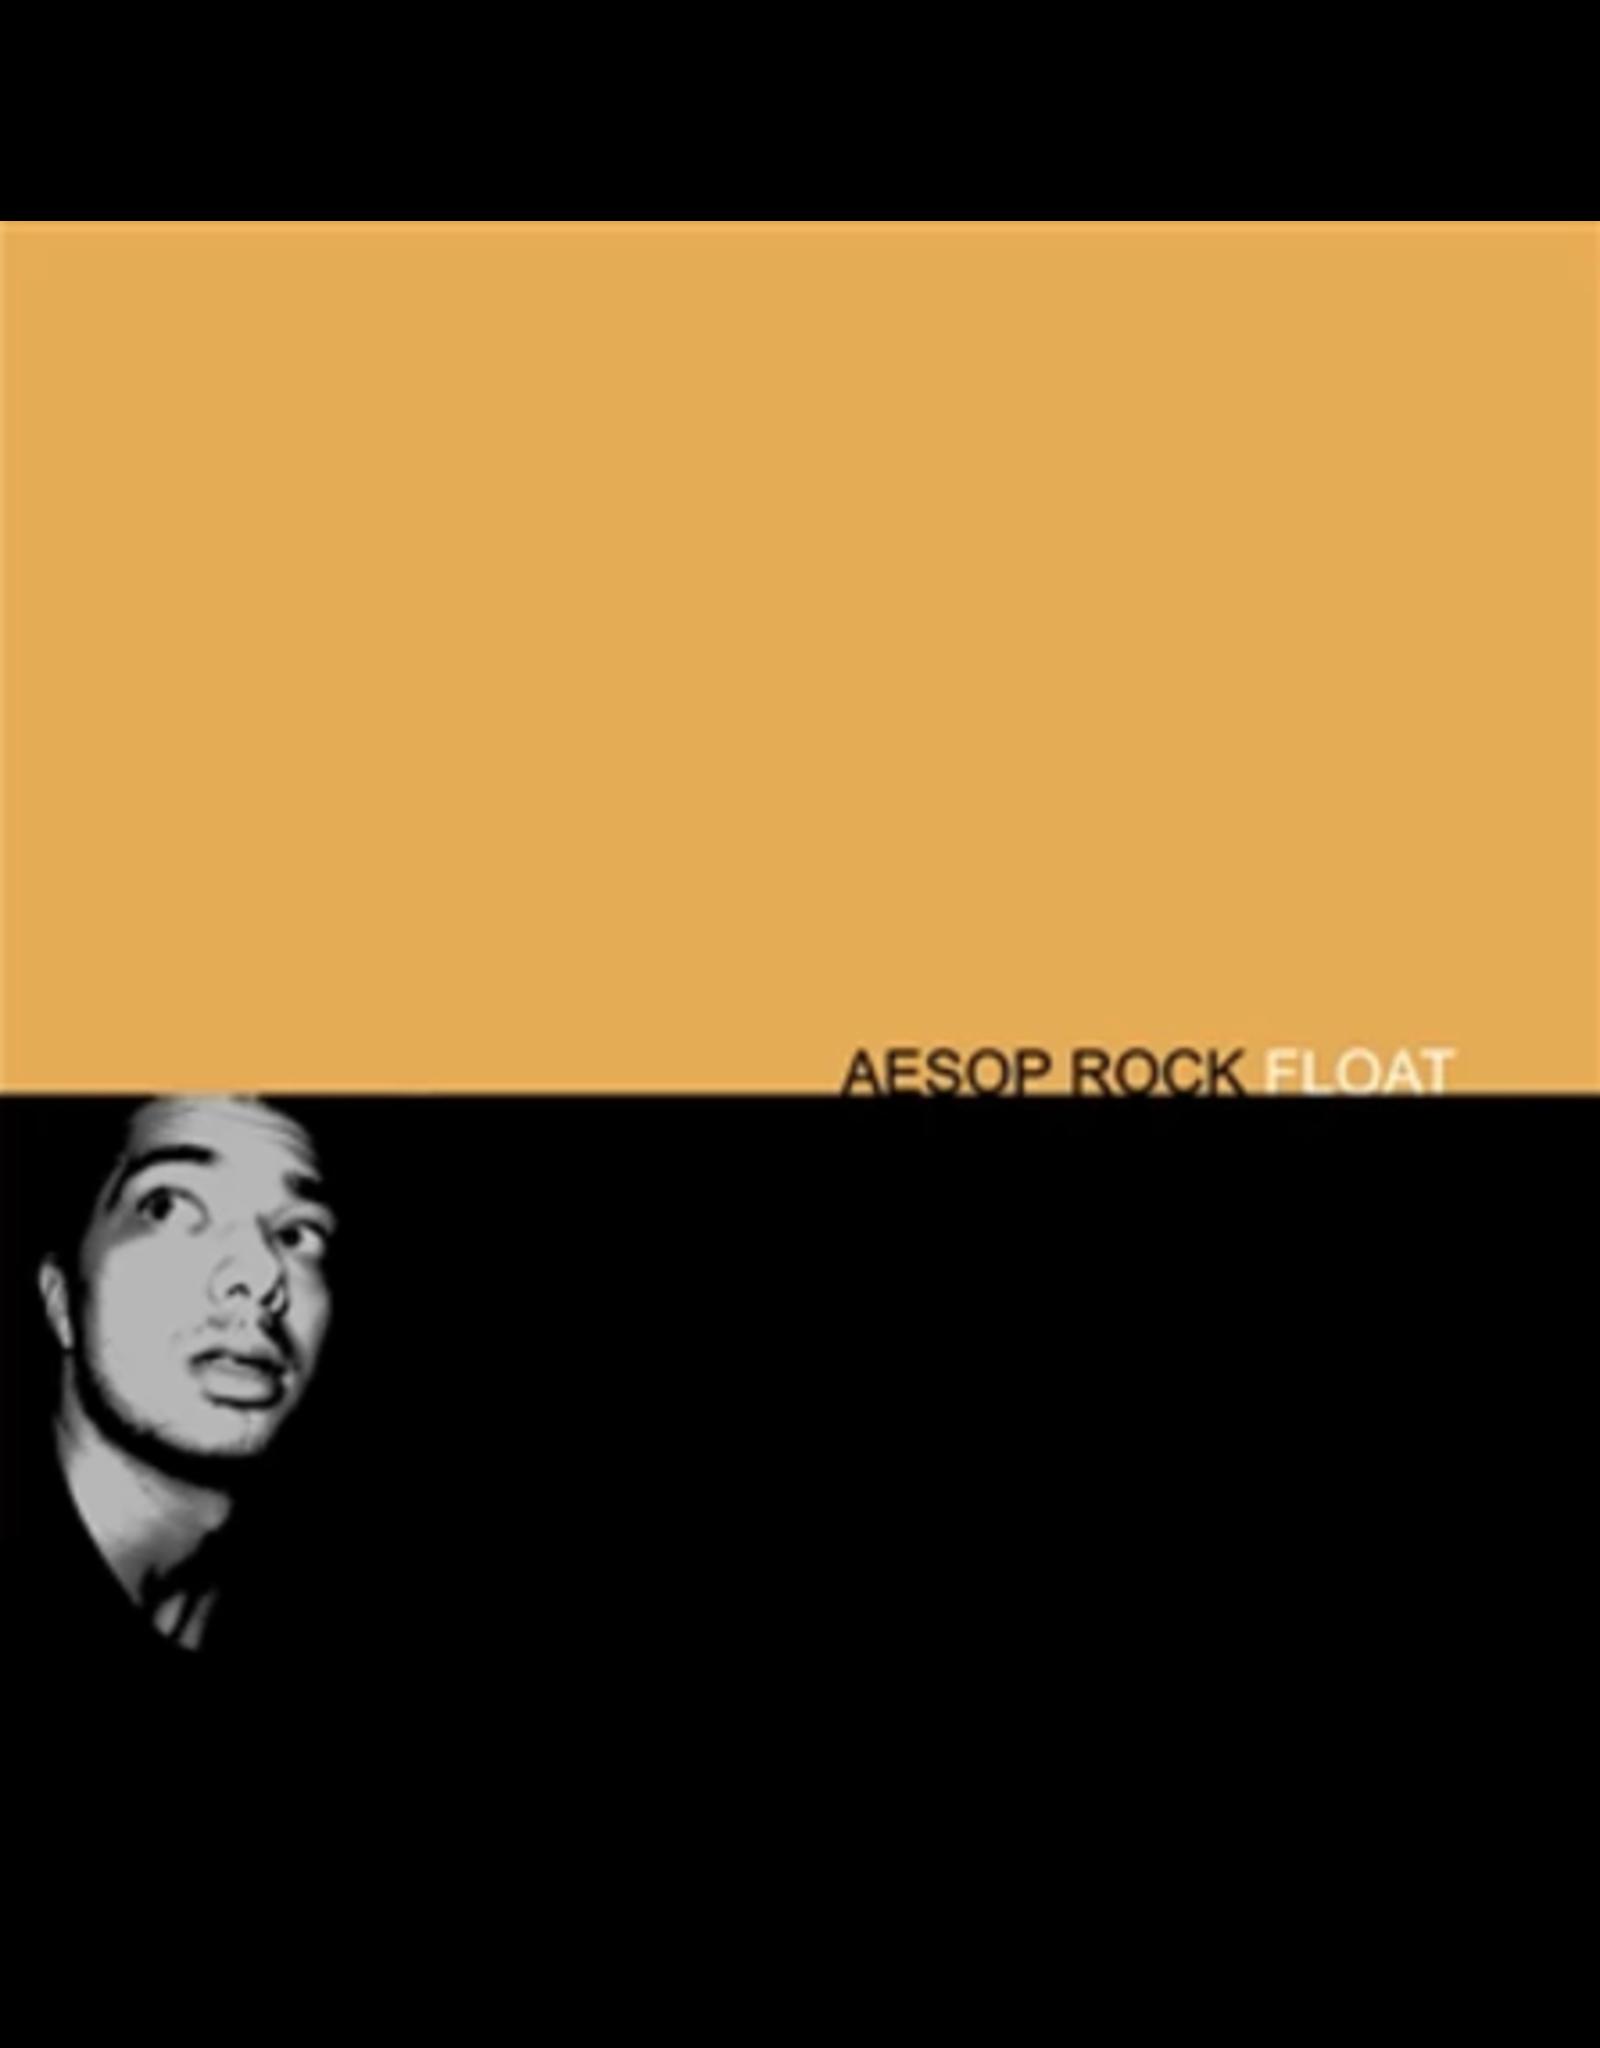 New Vinyl Aesop Rock - Float (20th Anniversary, Colored) 2LP